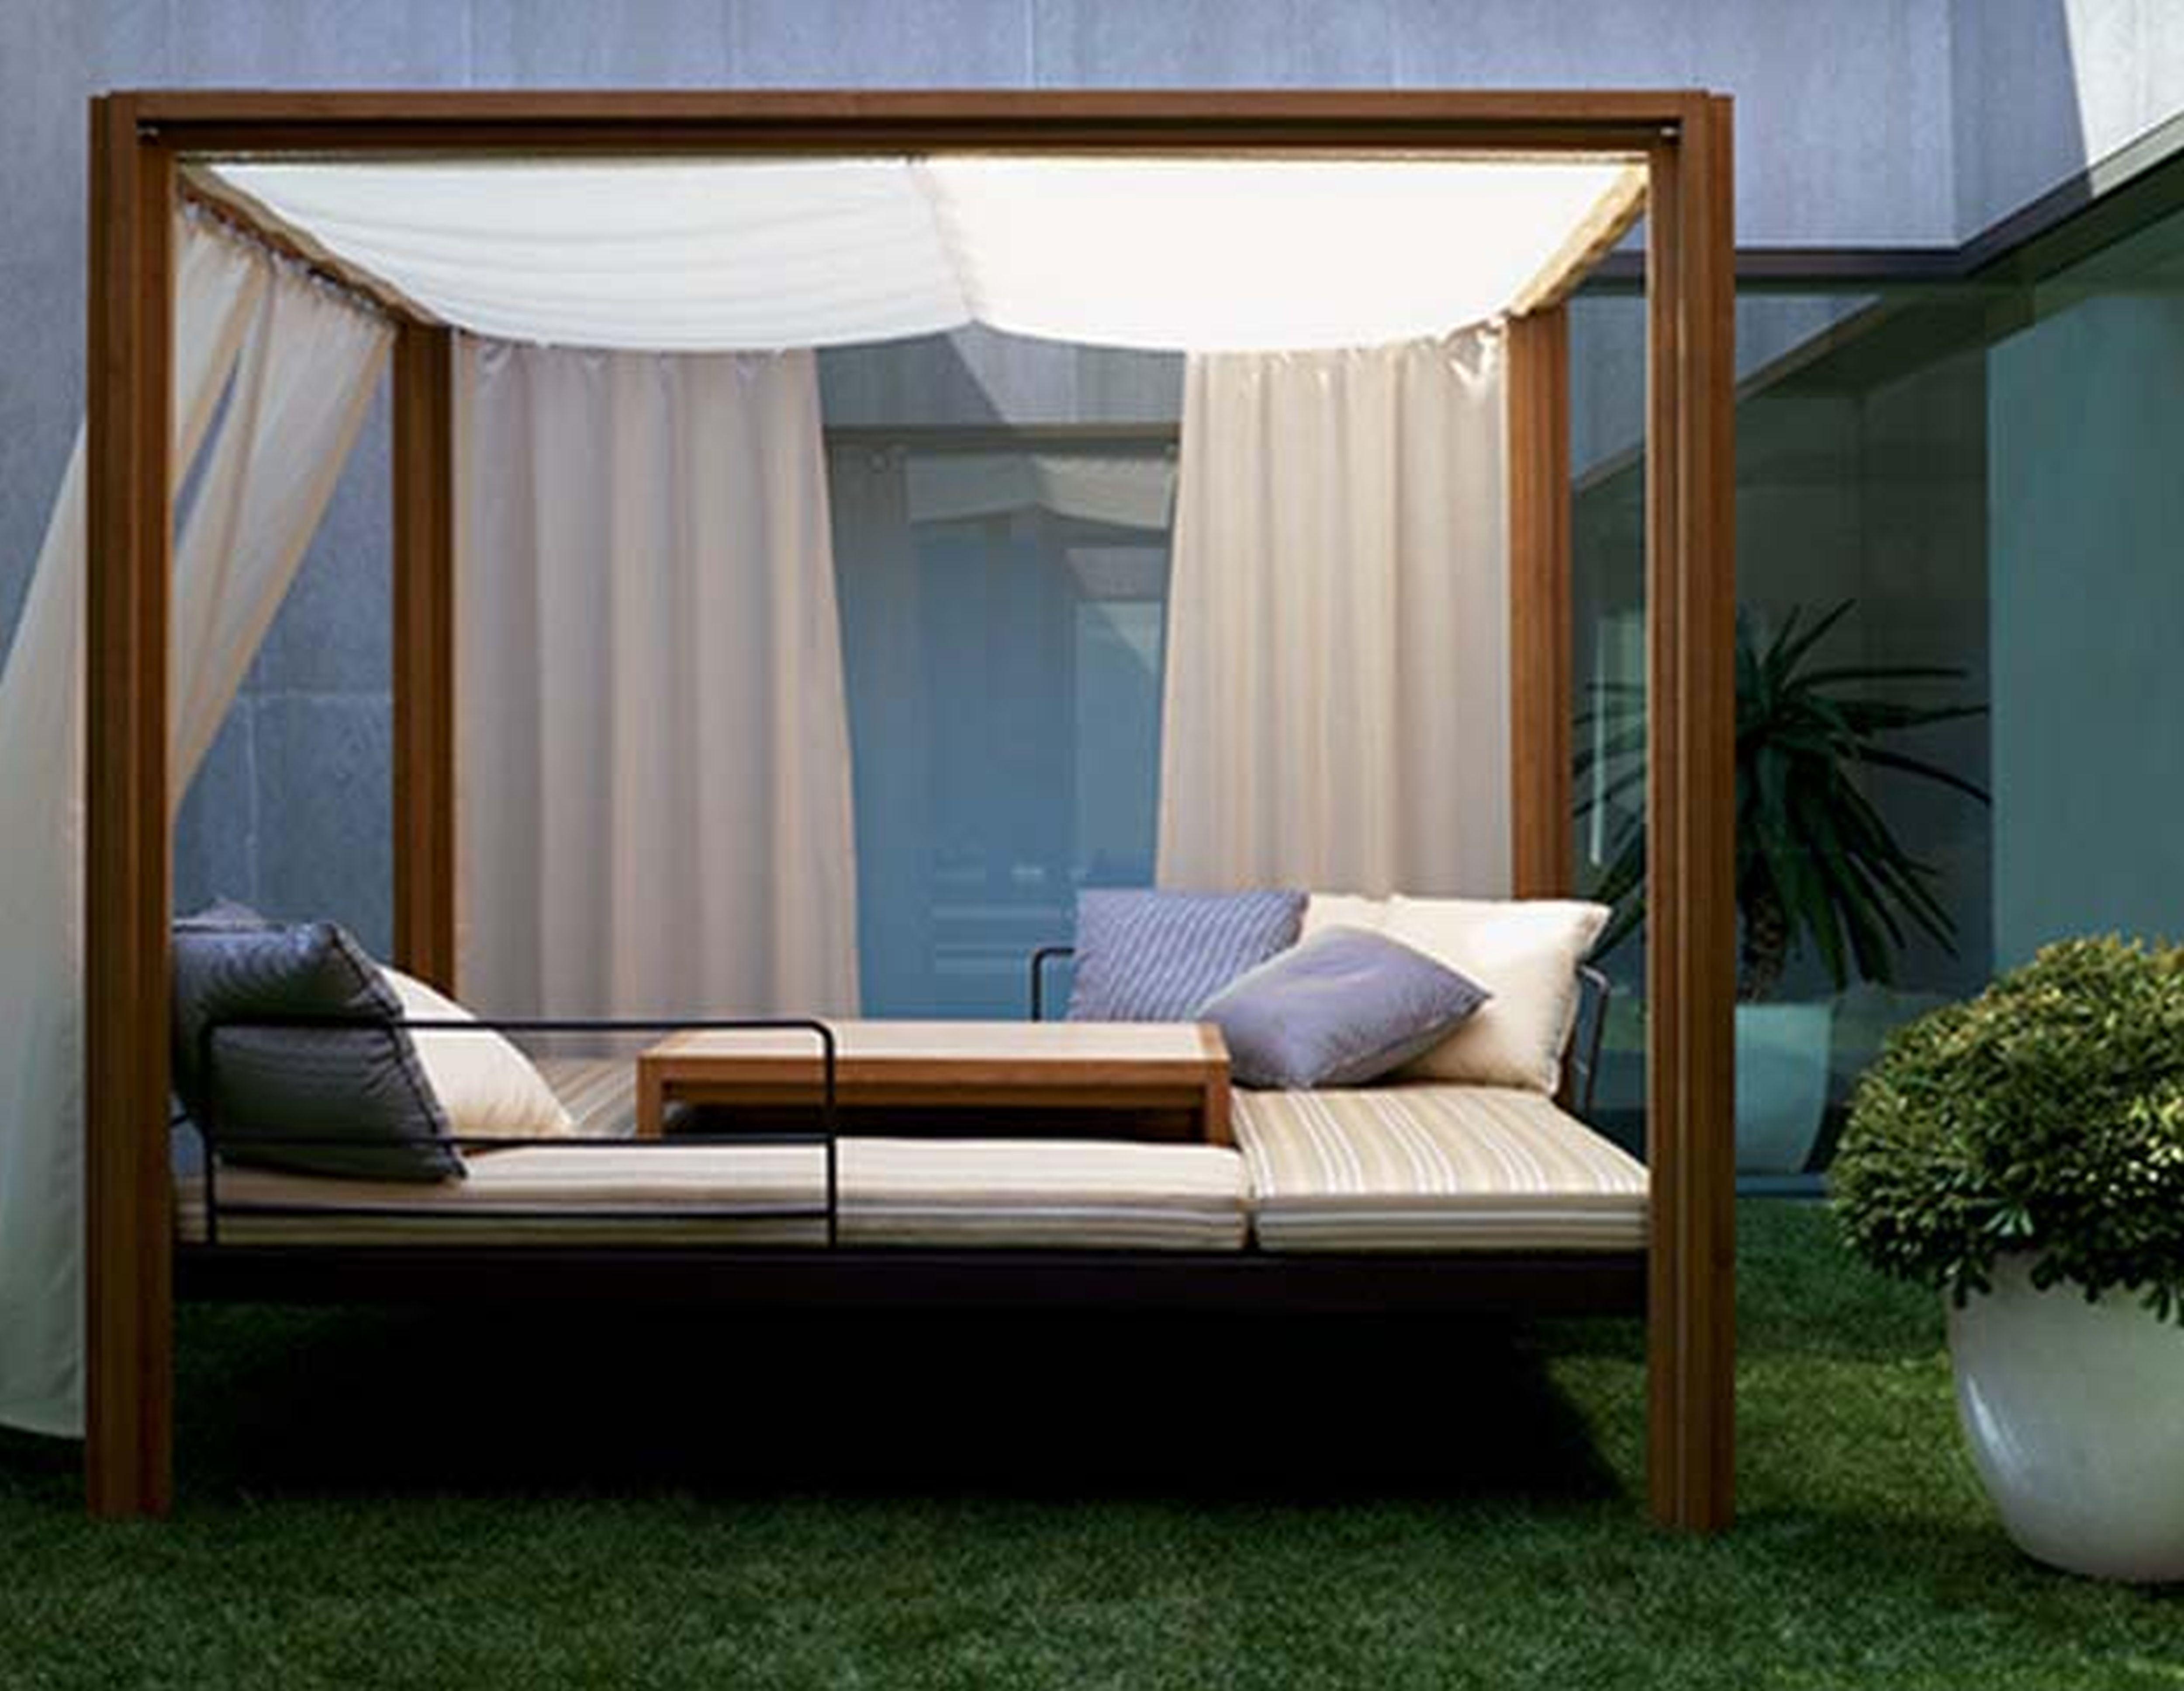 Unique How to Make Patio Furniture